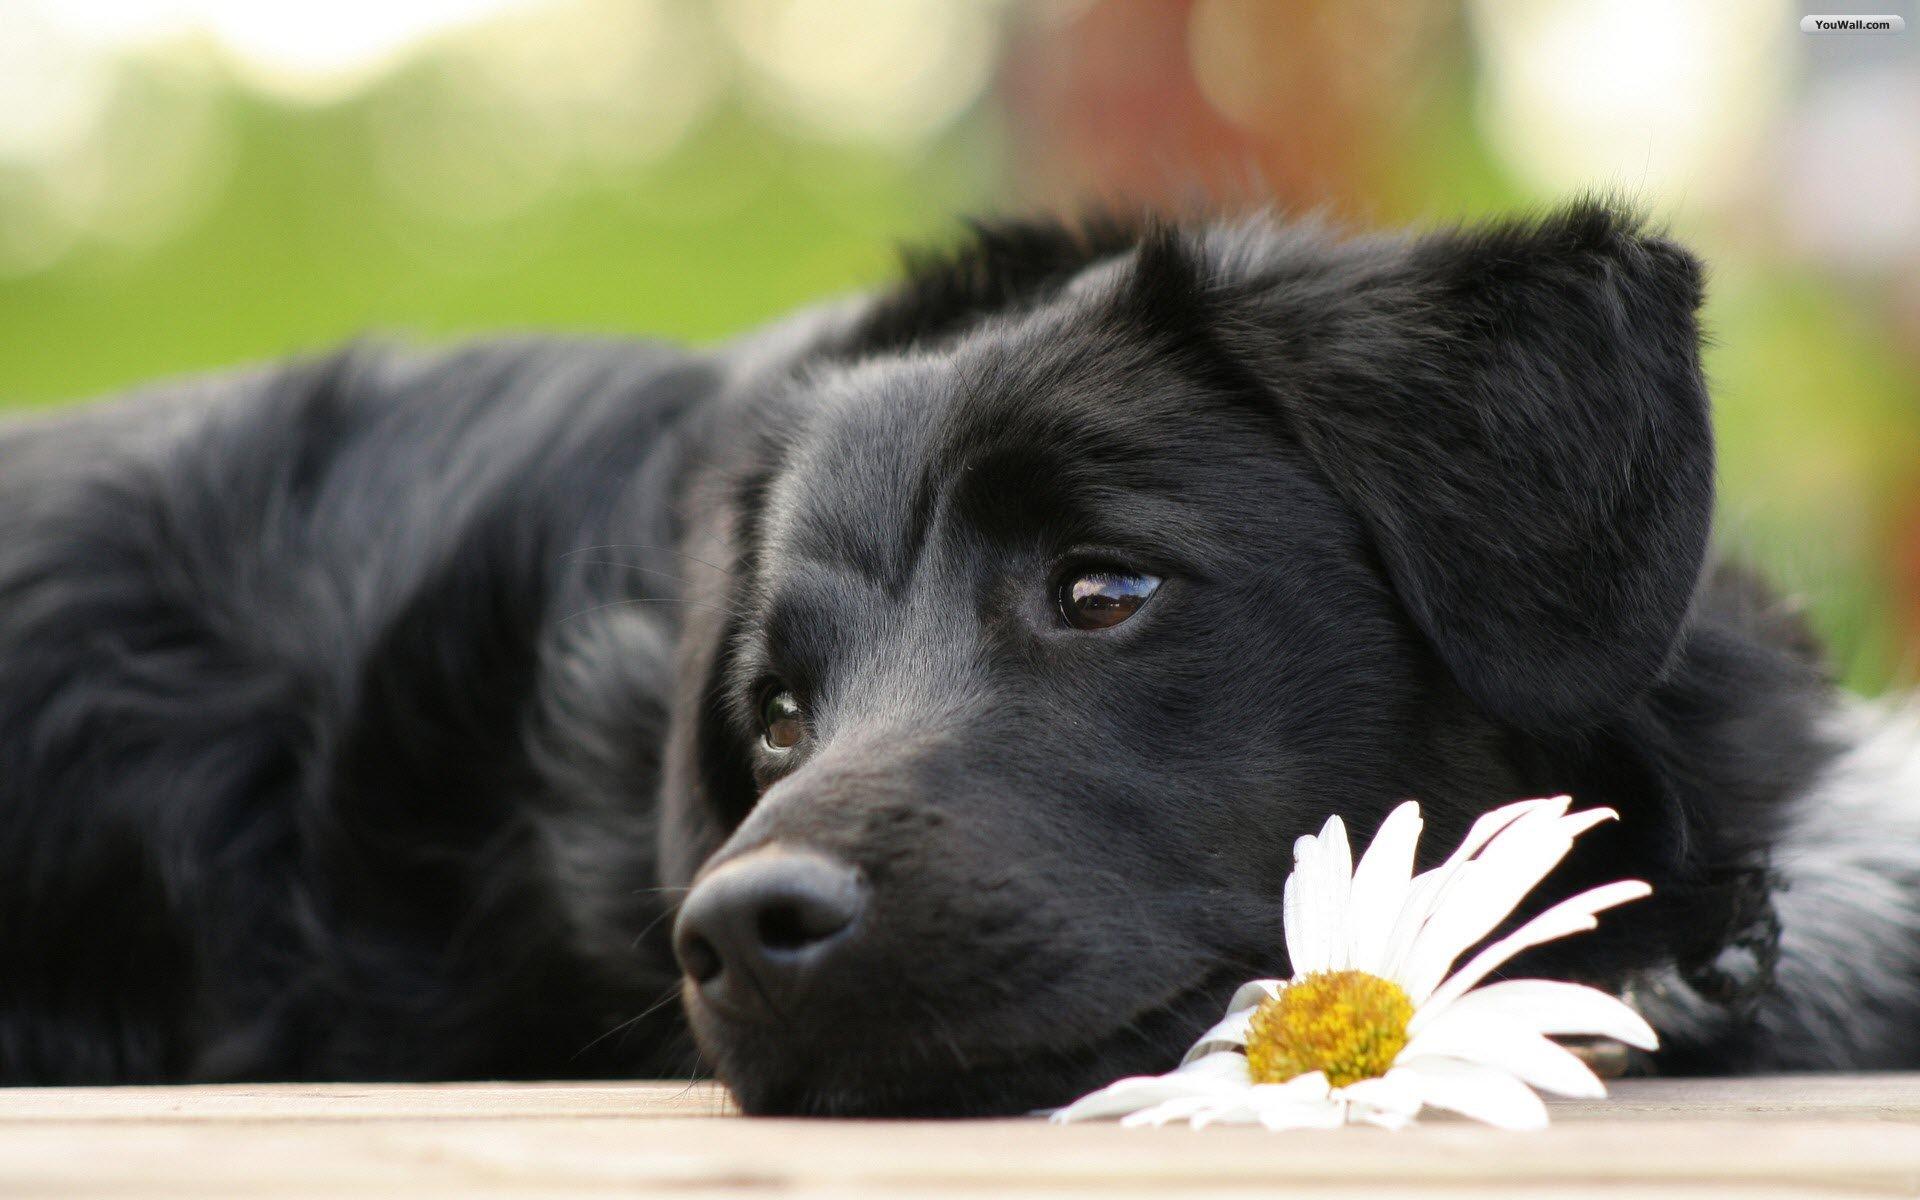 Black Beautiful Dog Wallpaper   wallpaperwallpapersfree wallpaper 1920x1200